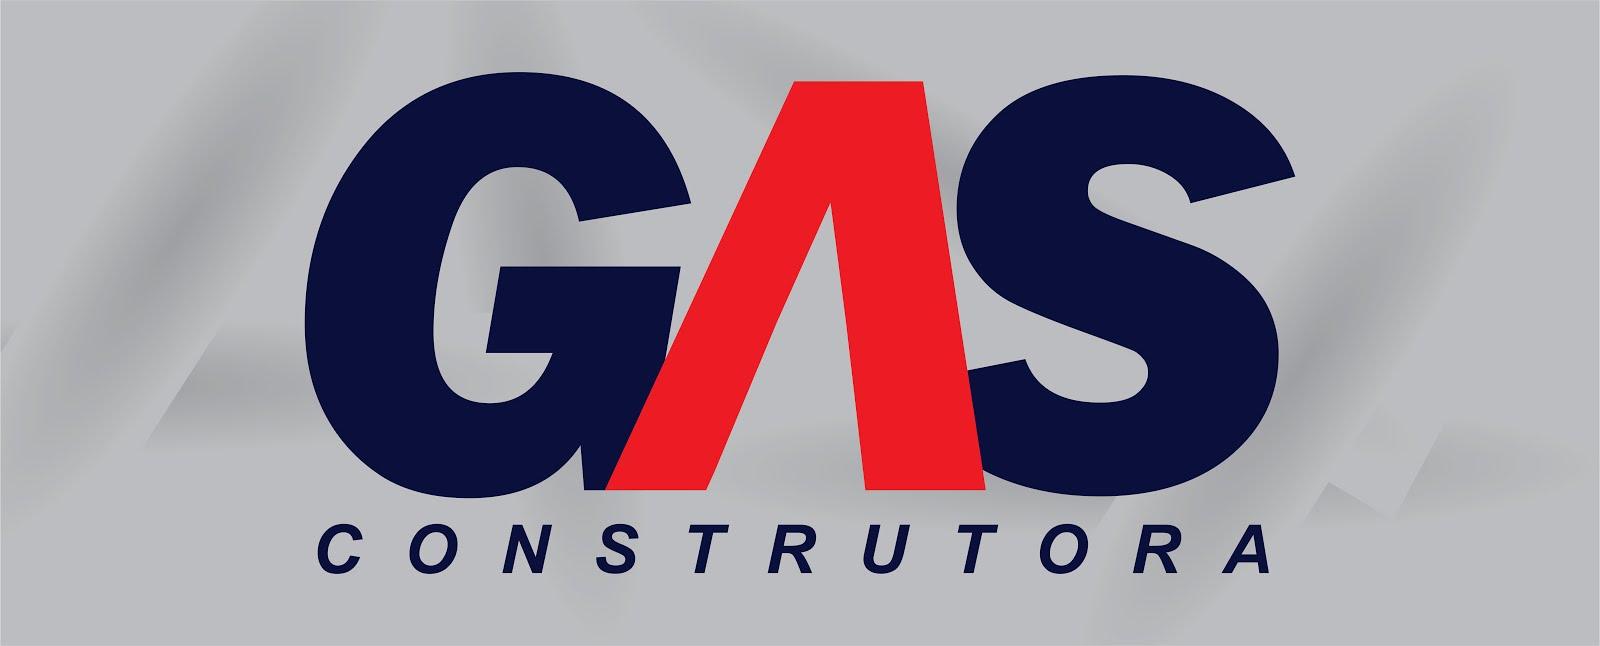 CONSTRUTORA G A S